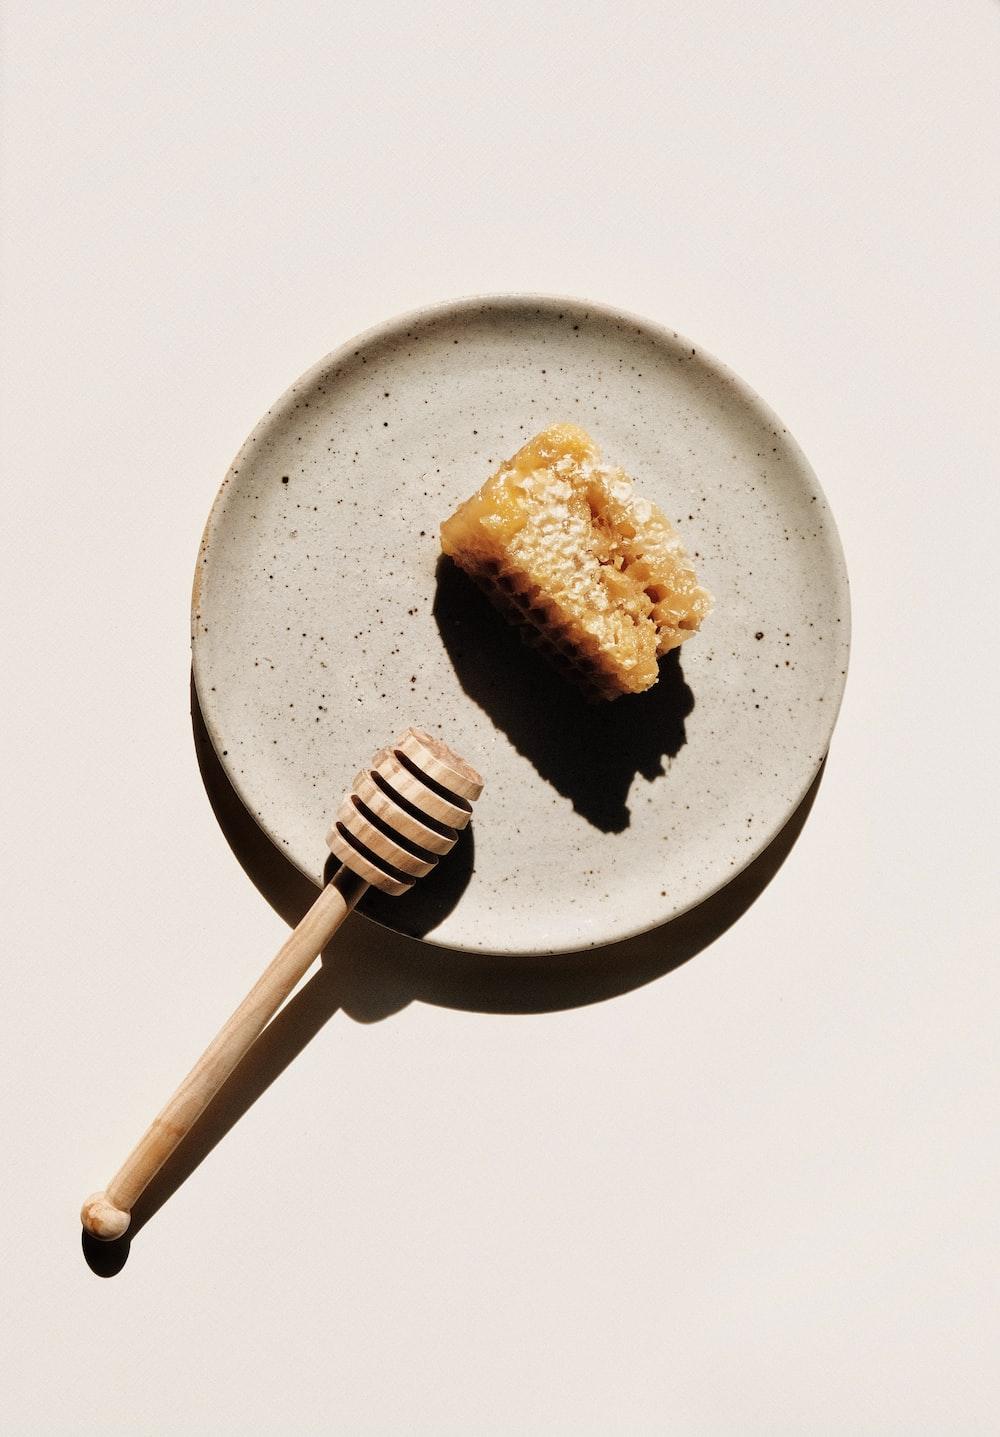 brown bread on black round plate